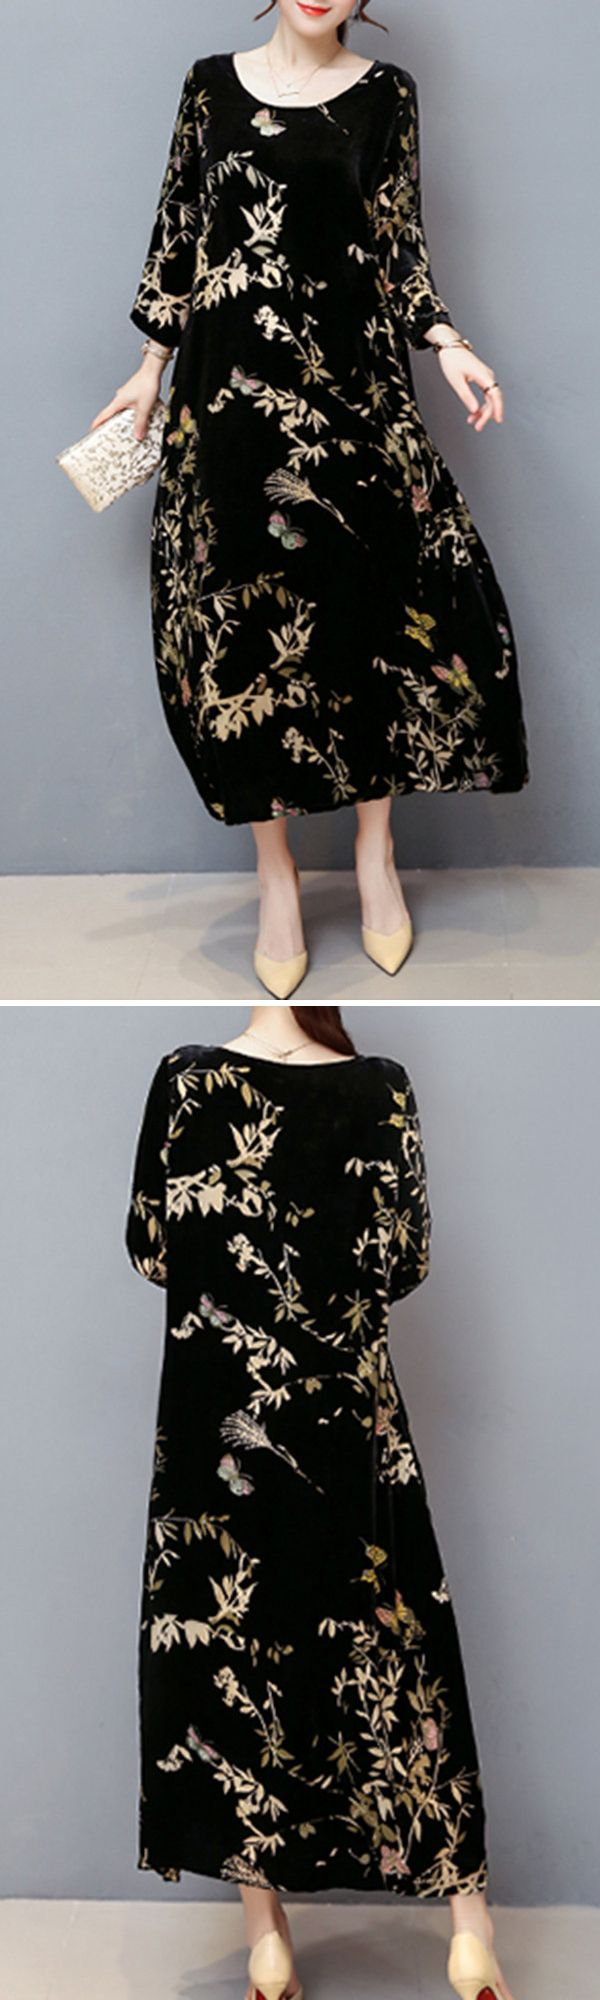 Vintage Women Printed Long Sleeve O-Neck Velvet Maxi Dress #fashion #style #Dress